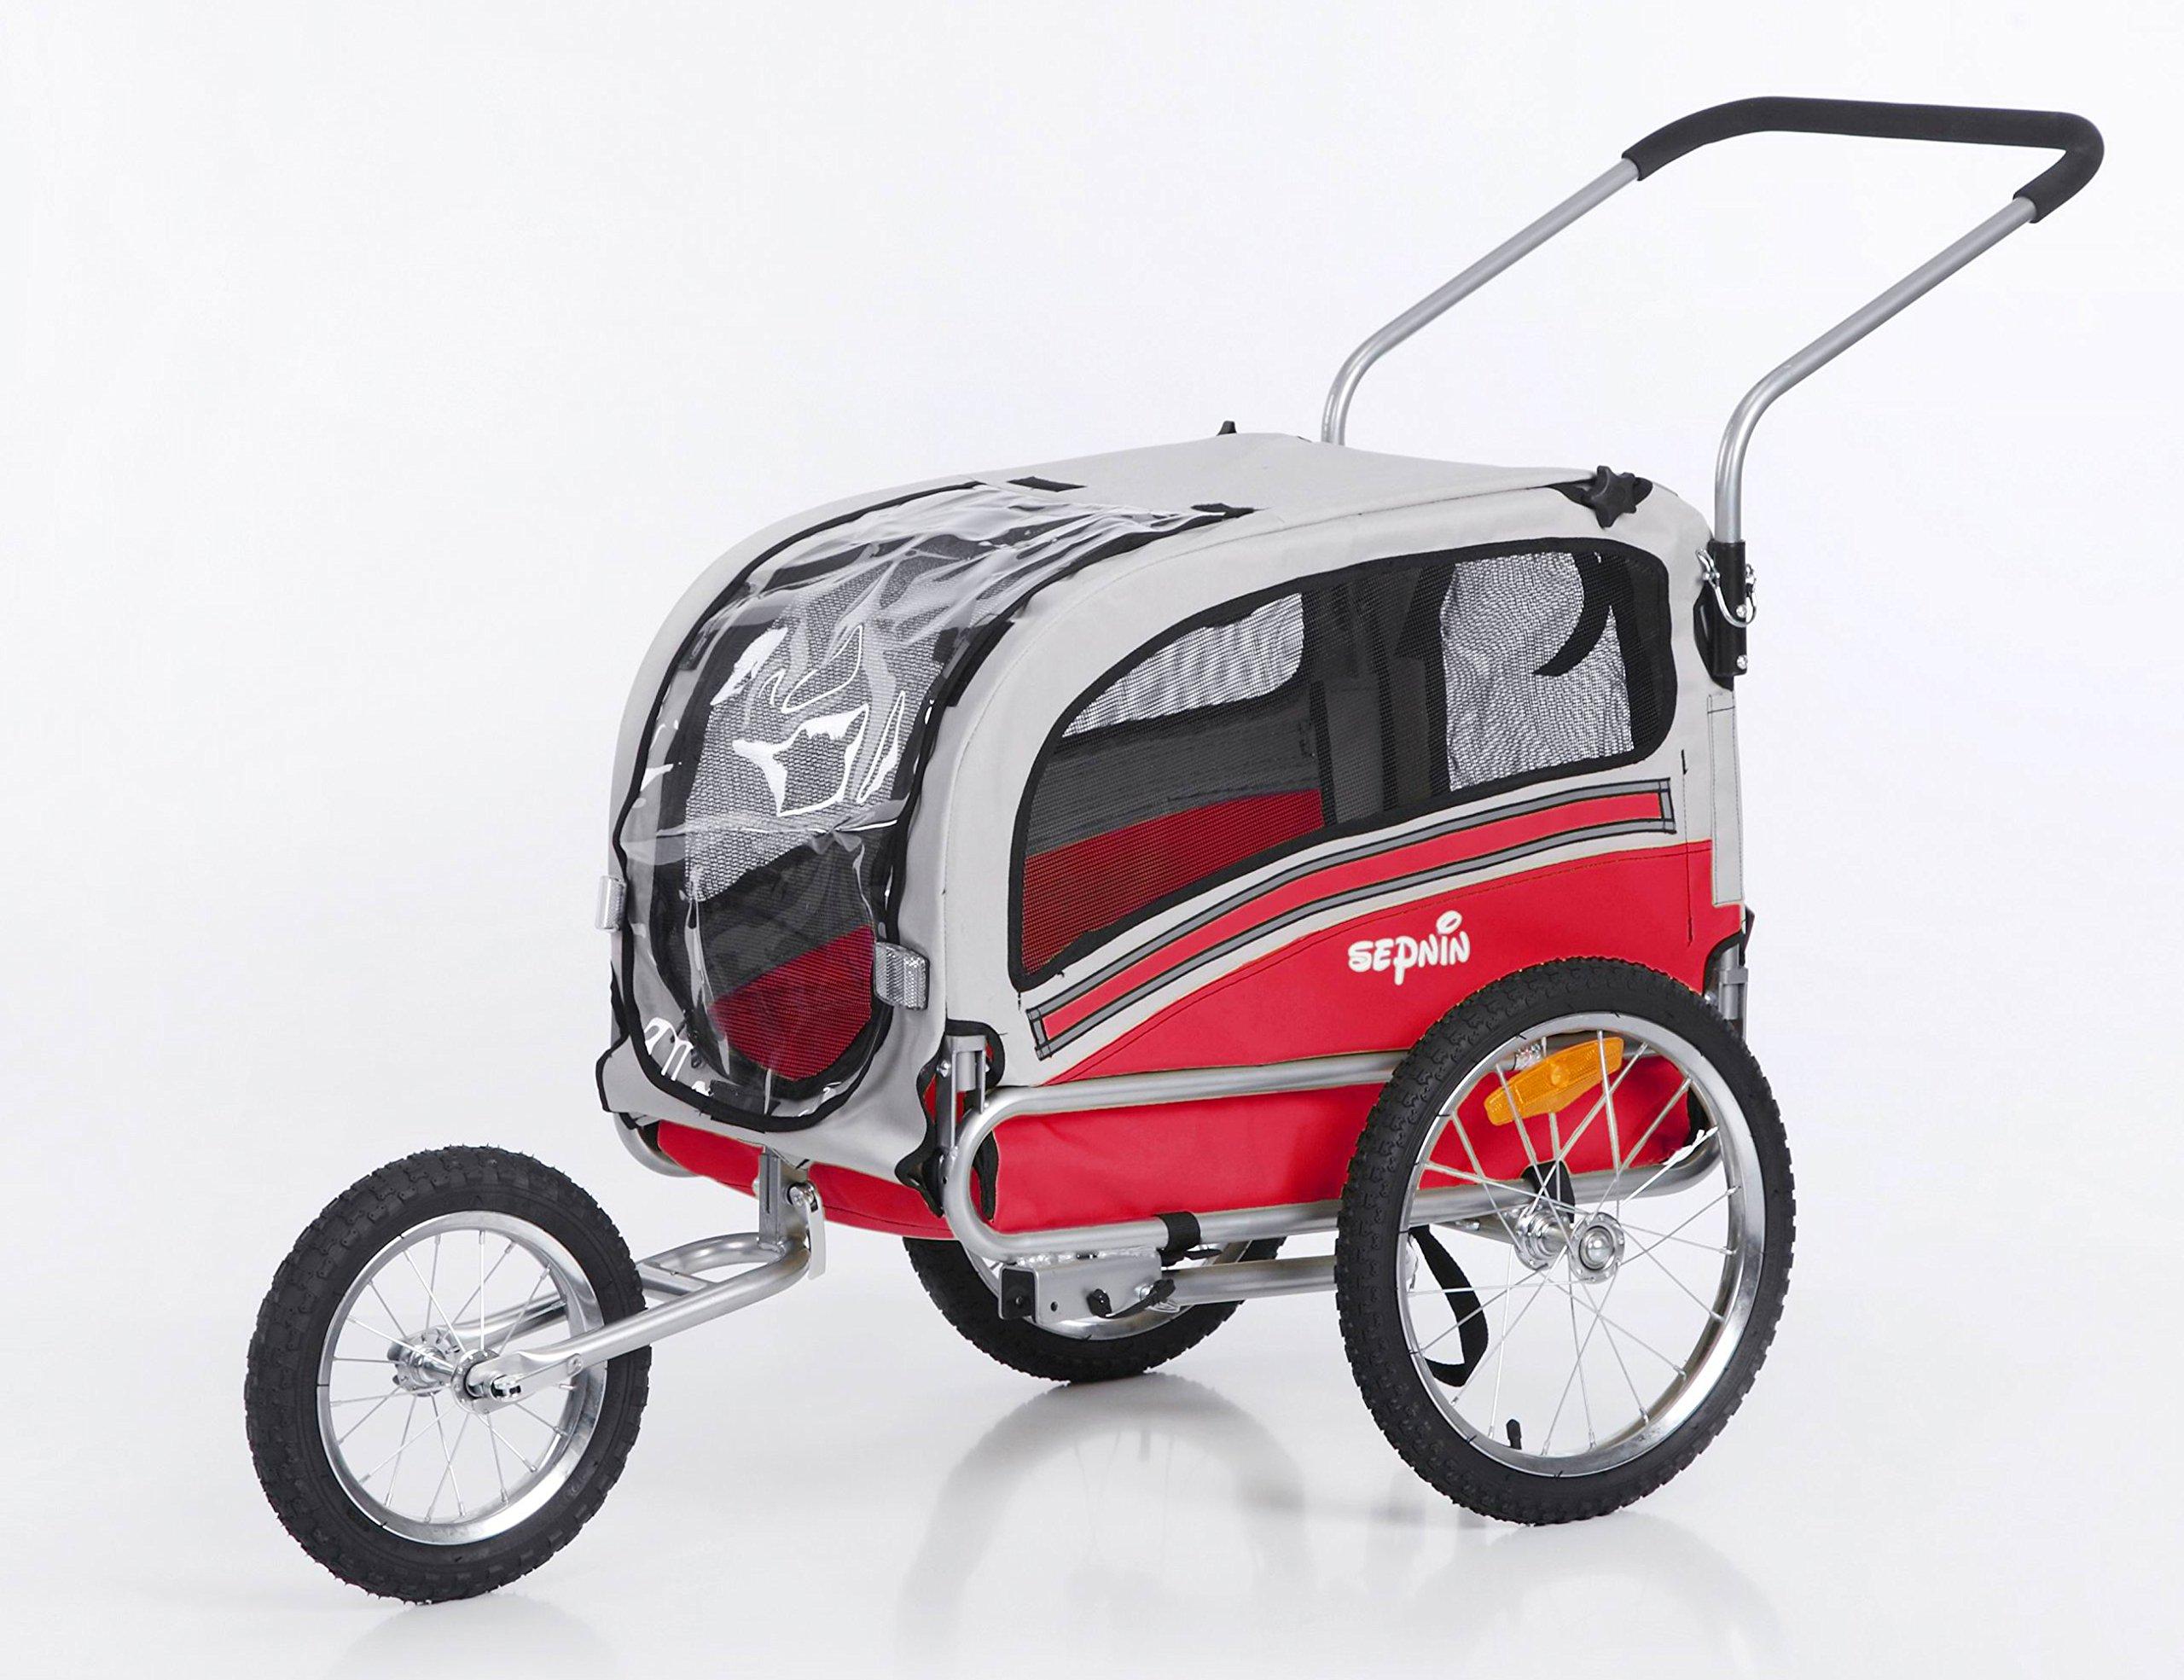 Sepnine & Leonpets Dog cart Trailer and Jogger of 2 in1 Medium pet Dog Bike Trailer Bicycle Carrier and Jogger 20303 (red/Grey) by Sepnine